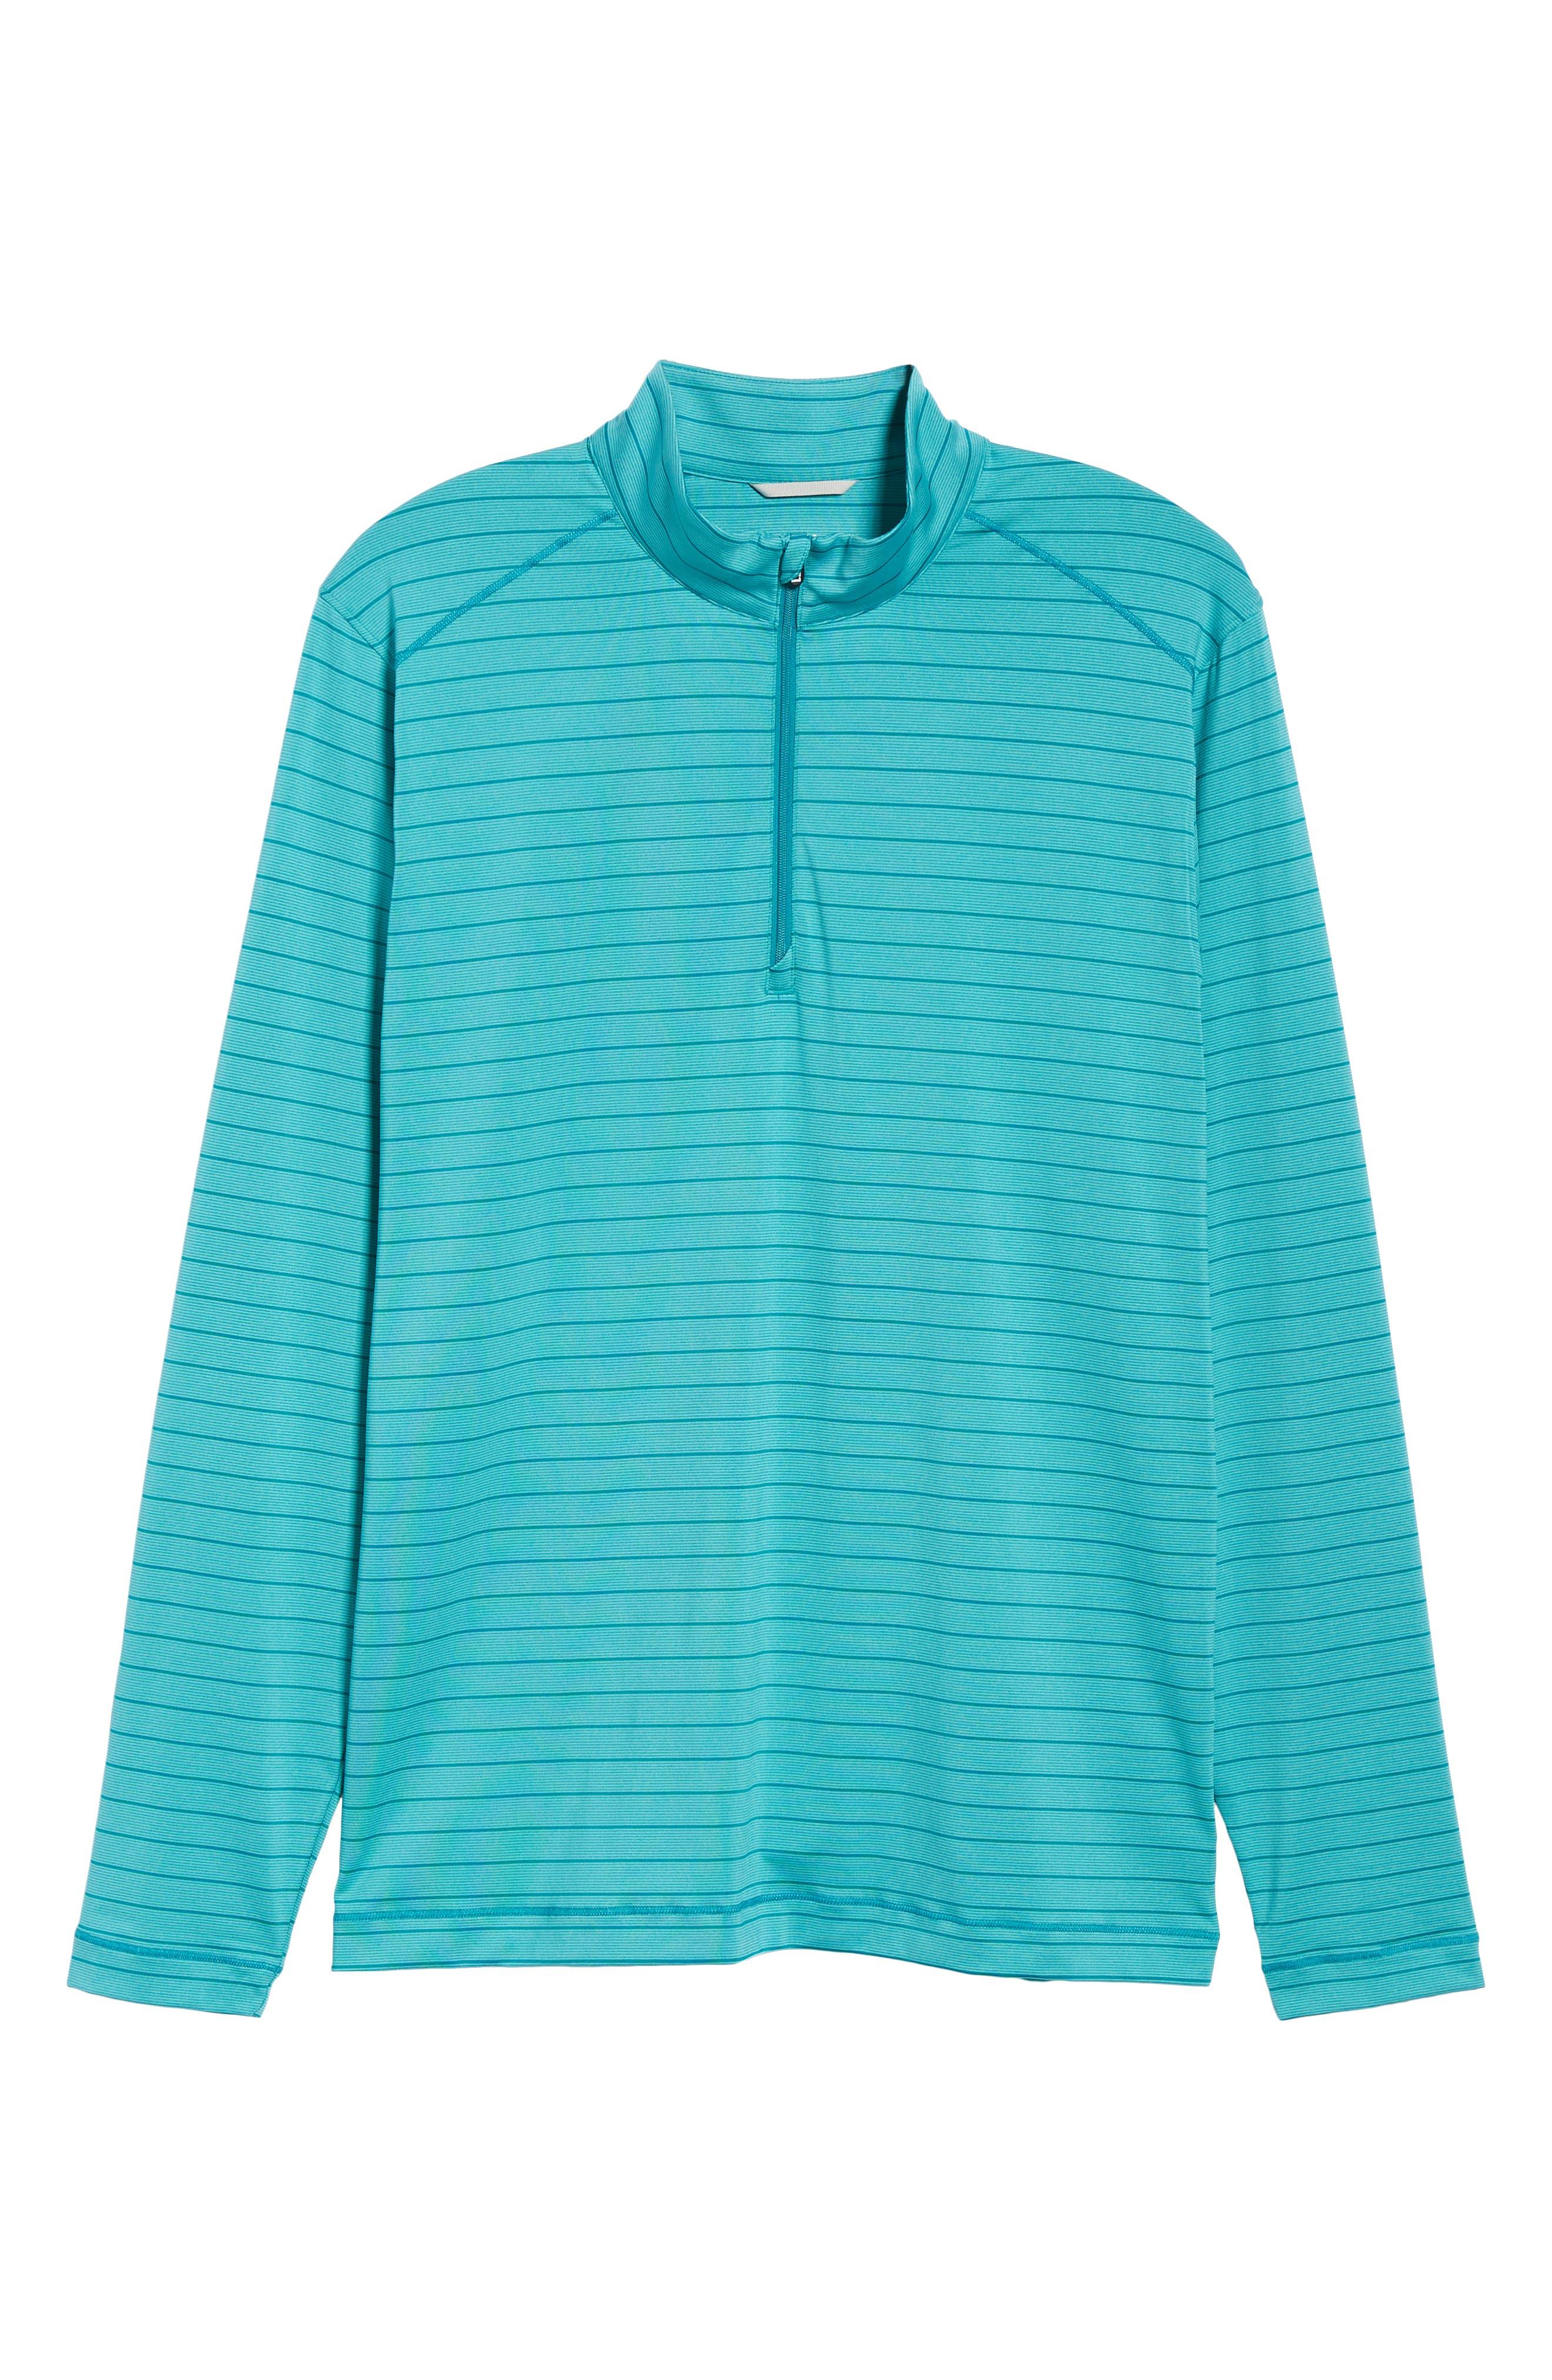 Holman Stripe Half Zip Pullover,                             Alternate thumbnail 6, color,                             AQUATIC HEATHER